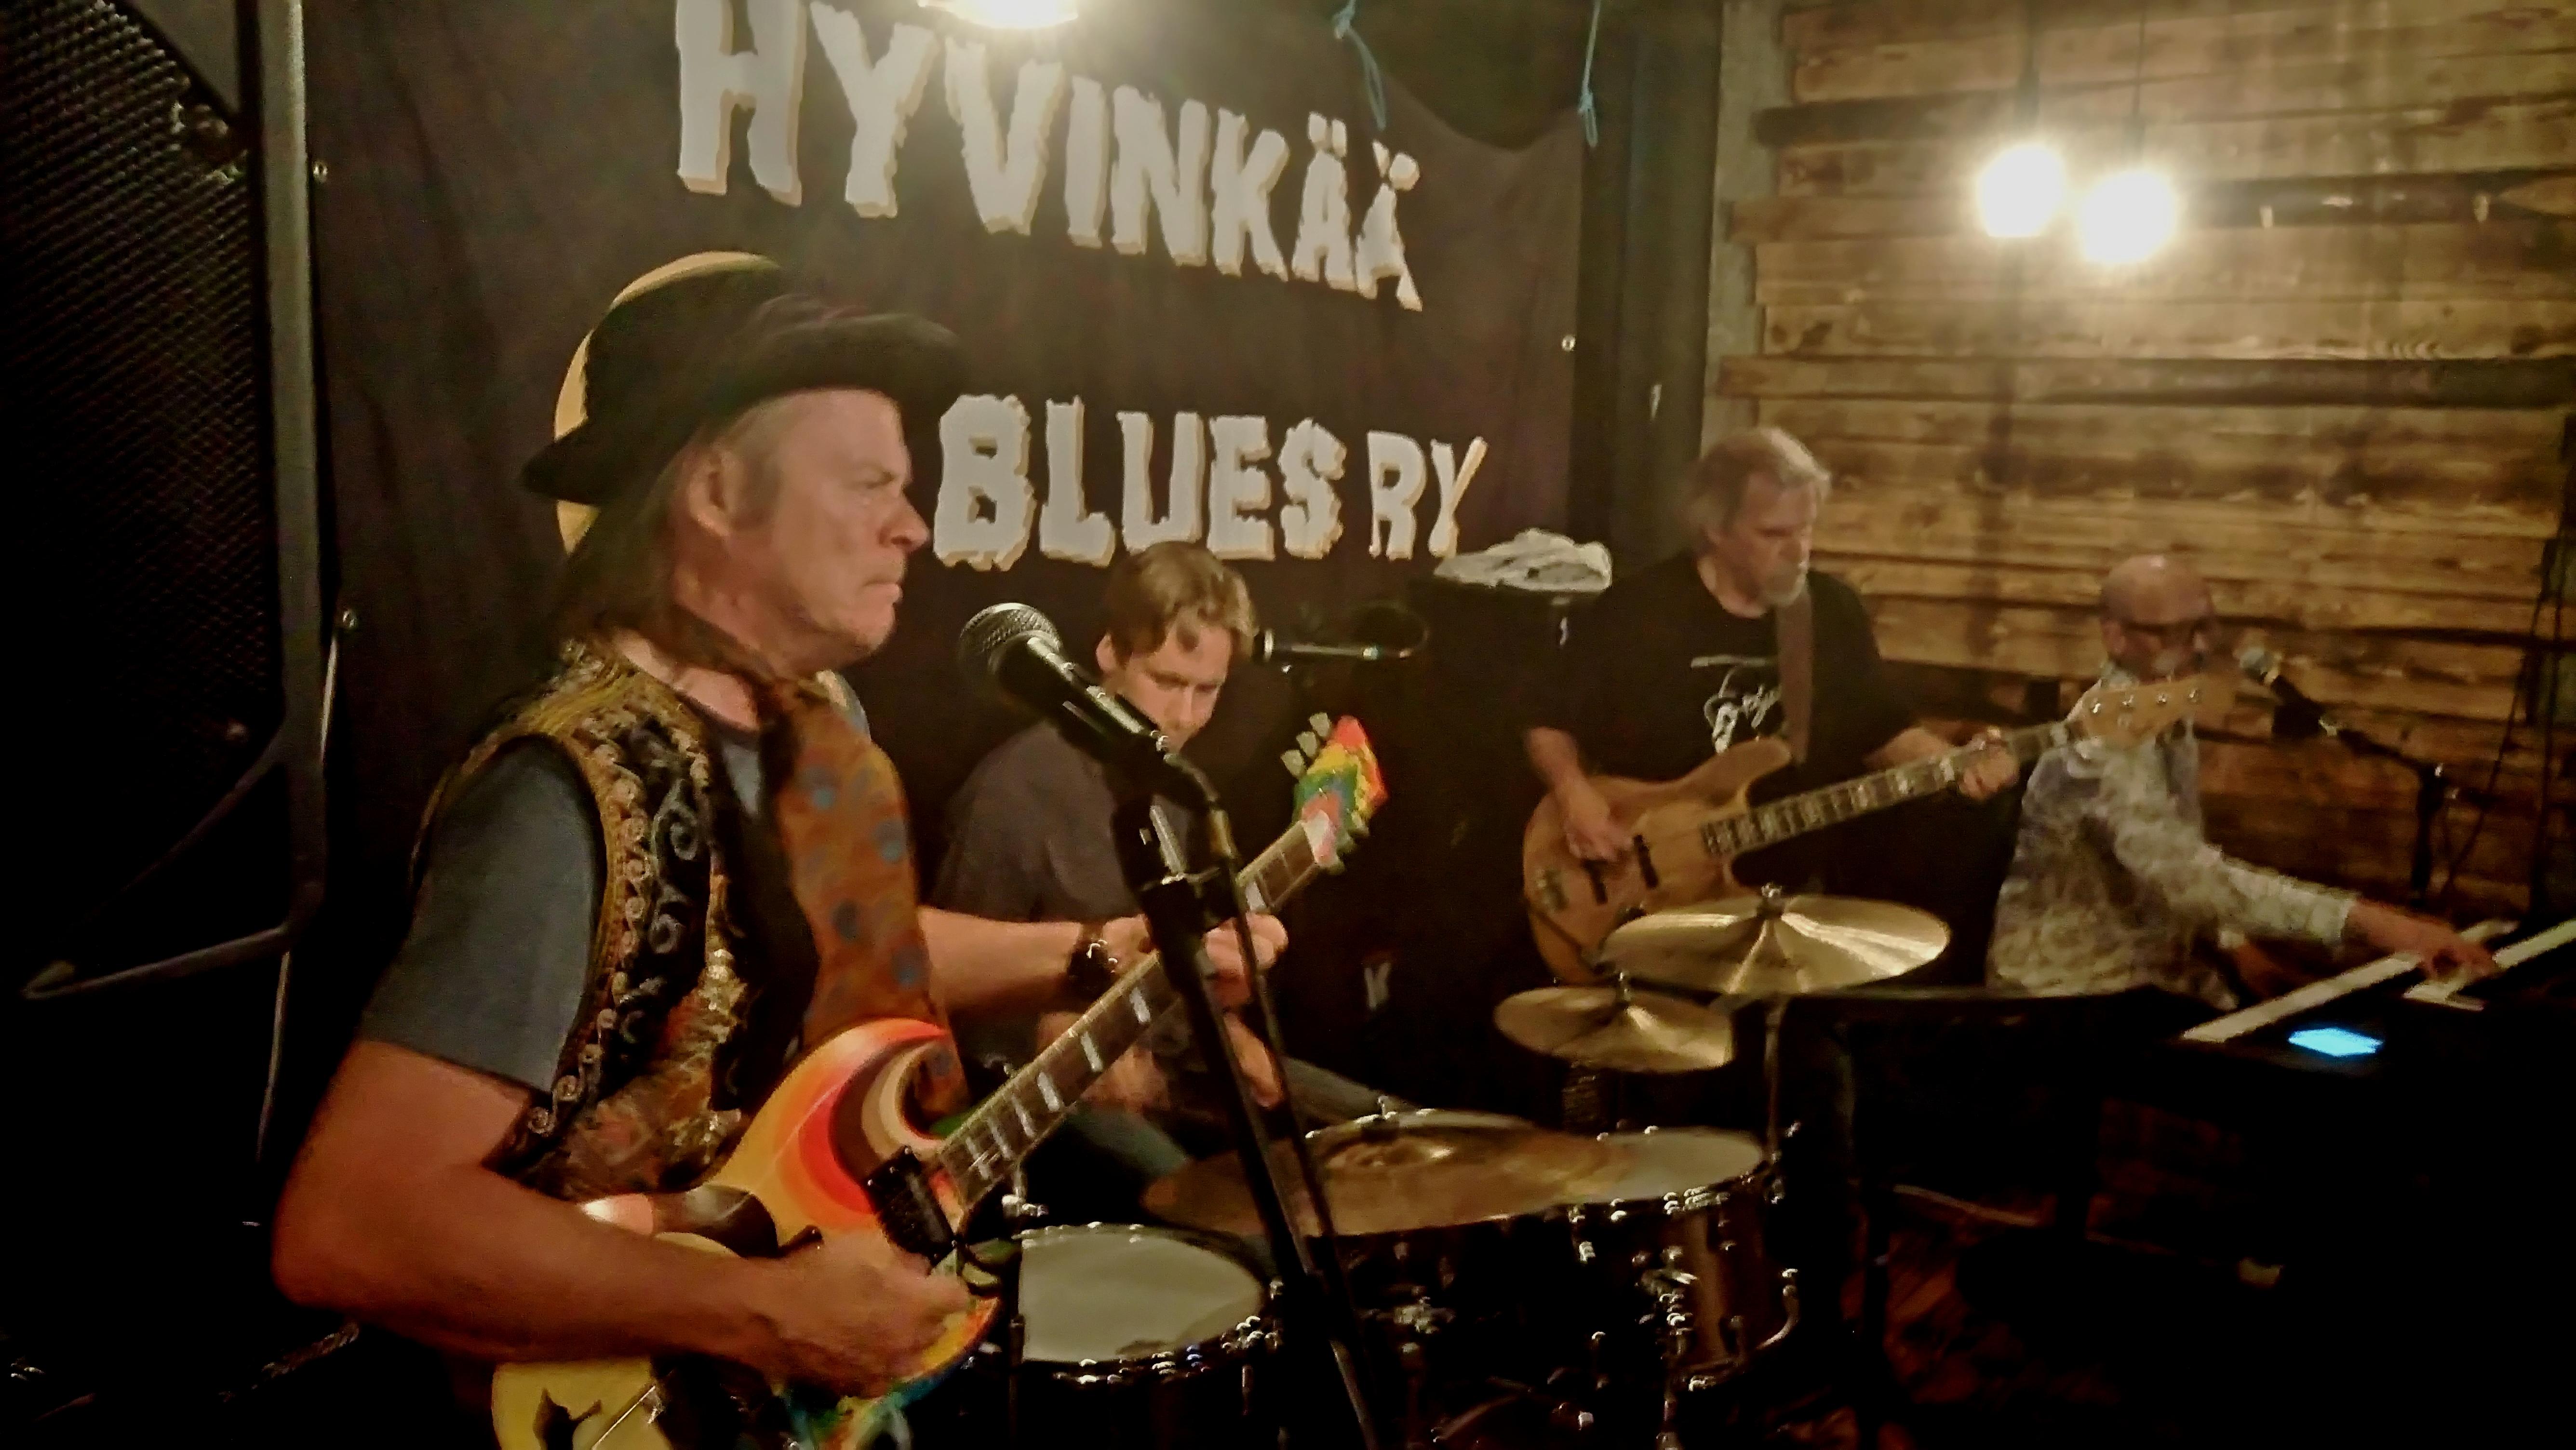 Ilkka Rantamäki & Blues Brokers